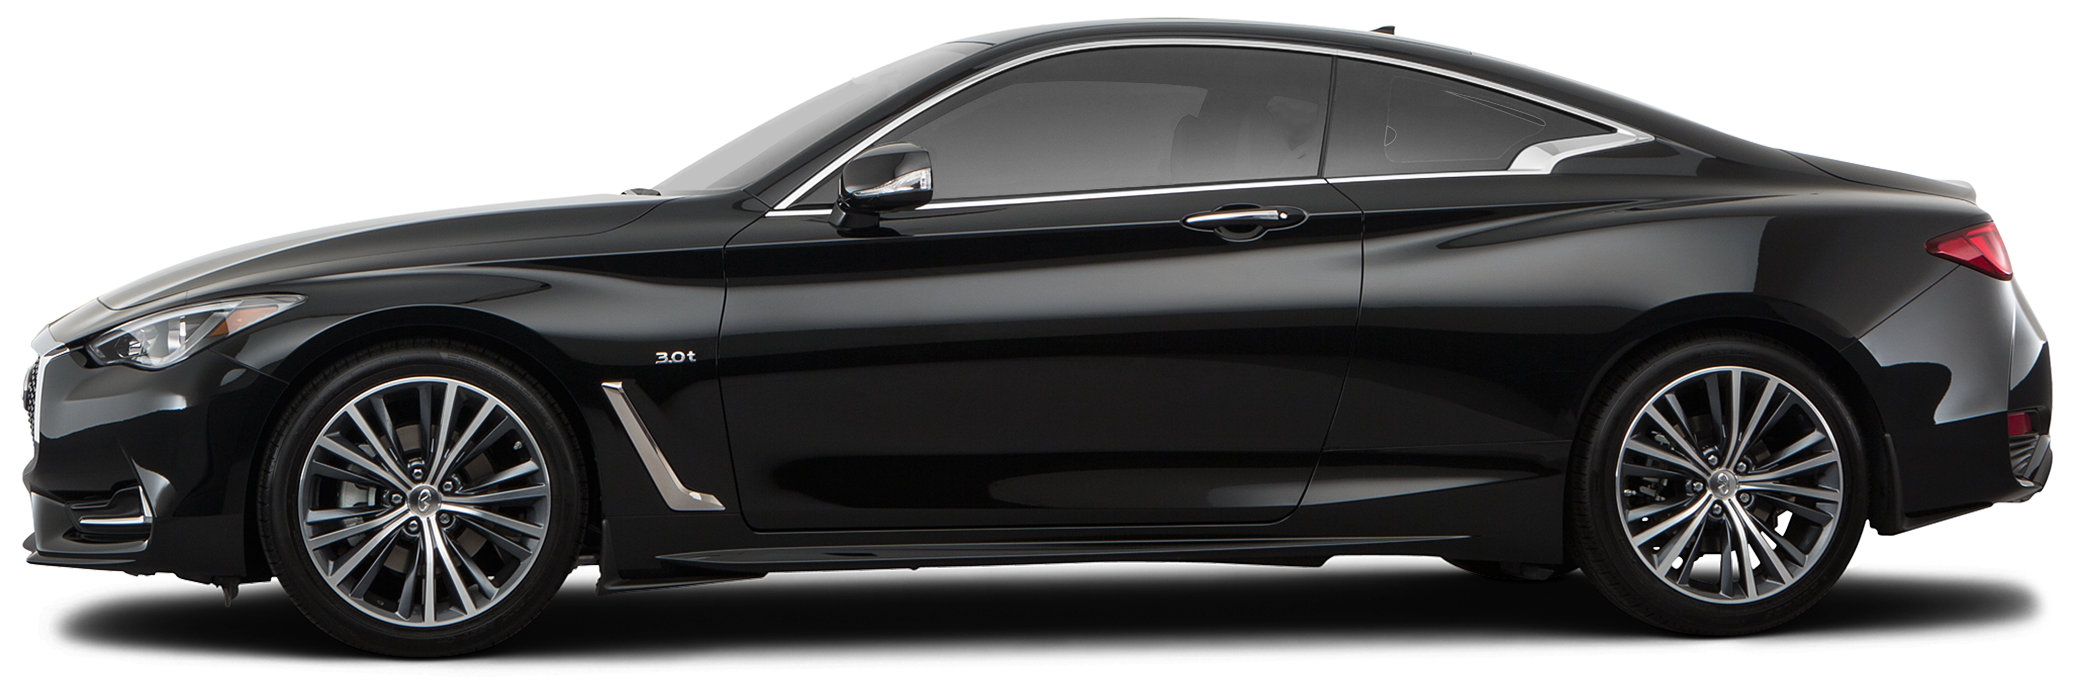 2019 INFINITI Q60 Coupe 3.0t PURE